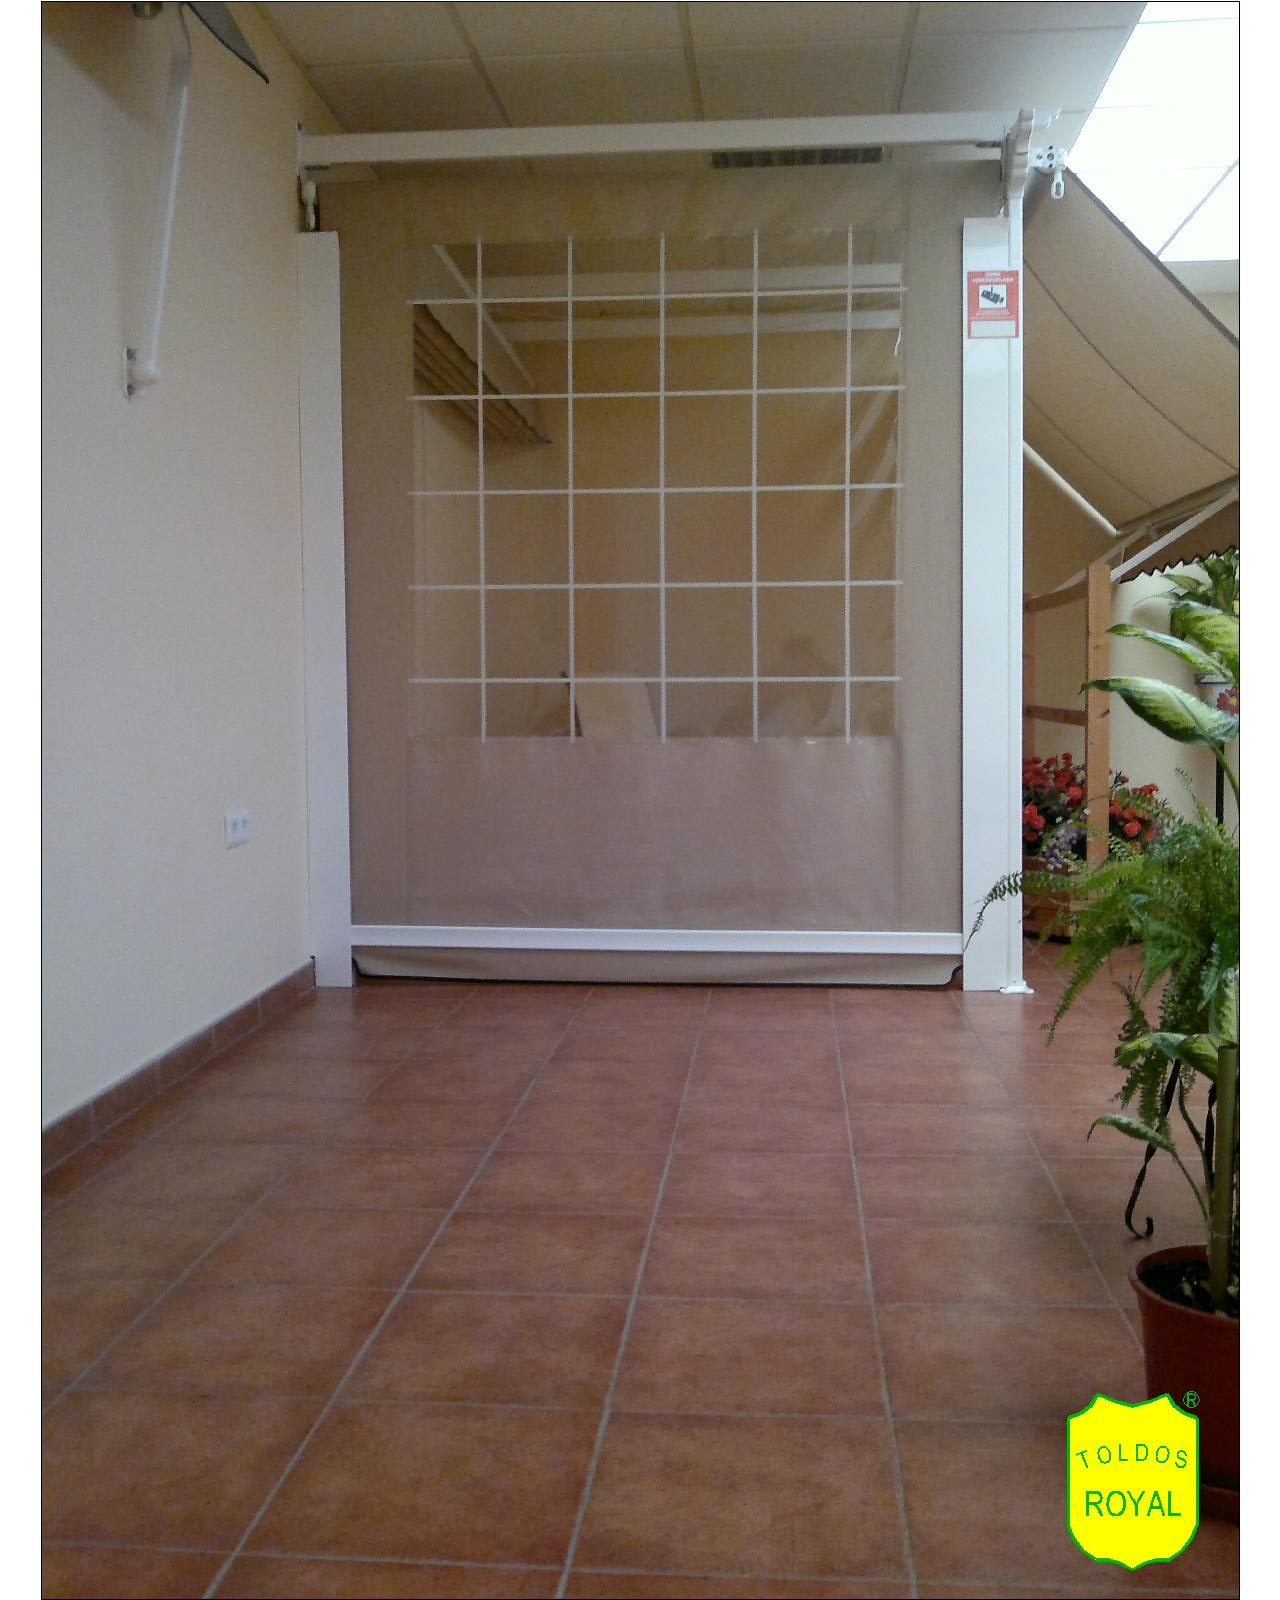 Estructura de toldos modelo t nel plegable toldos for Estructura de toldo